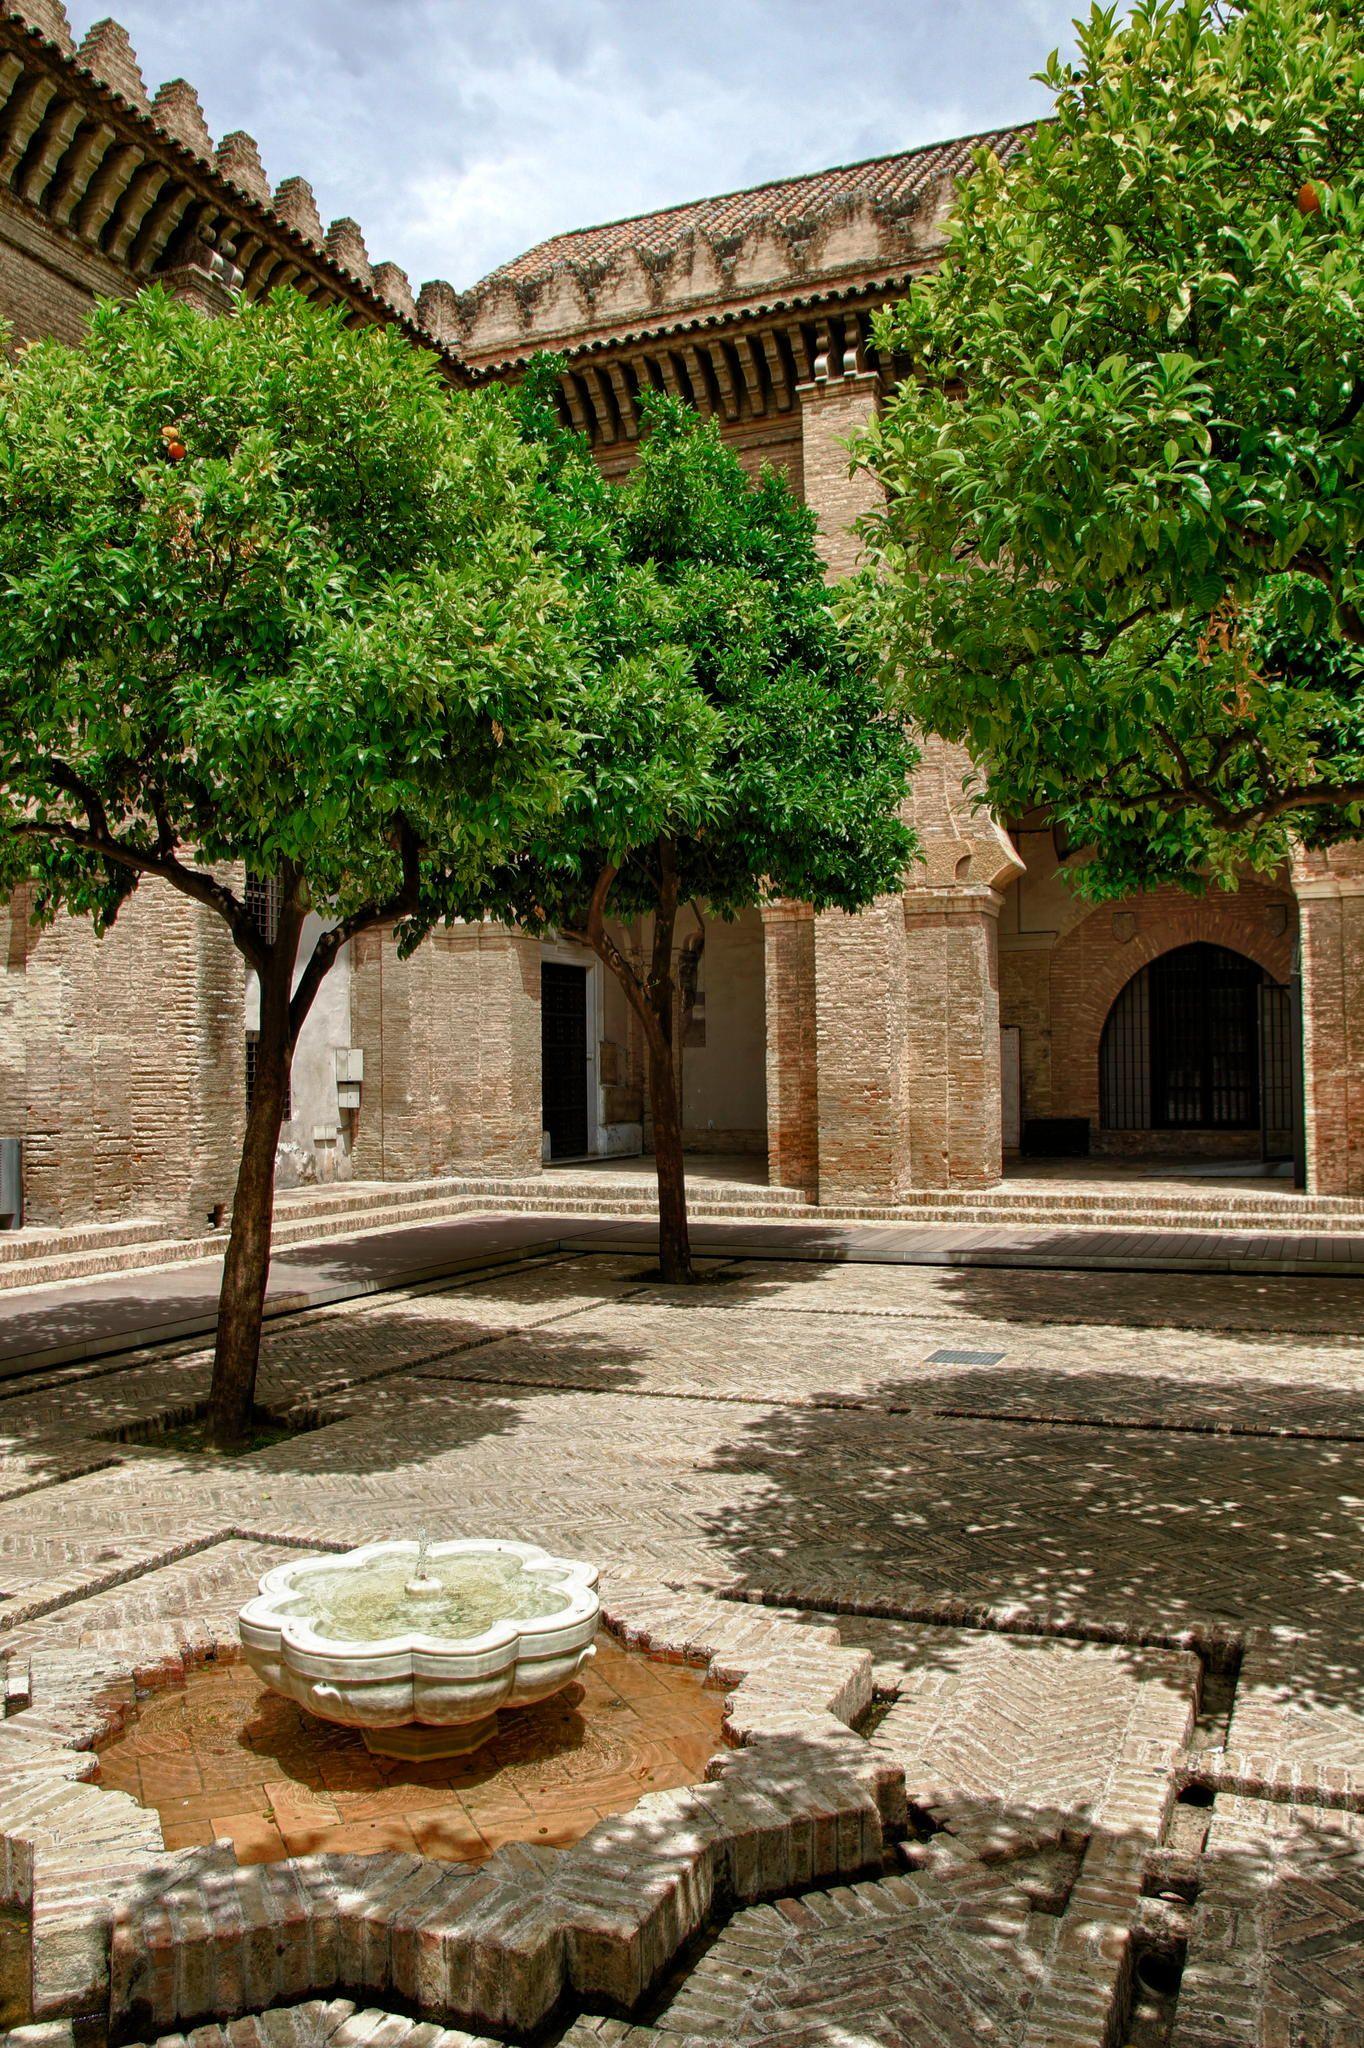 Courtyard Seville by Alexander Zonneveld on 500px